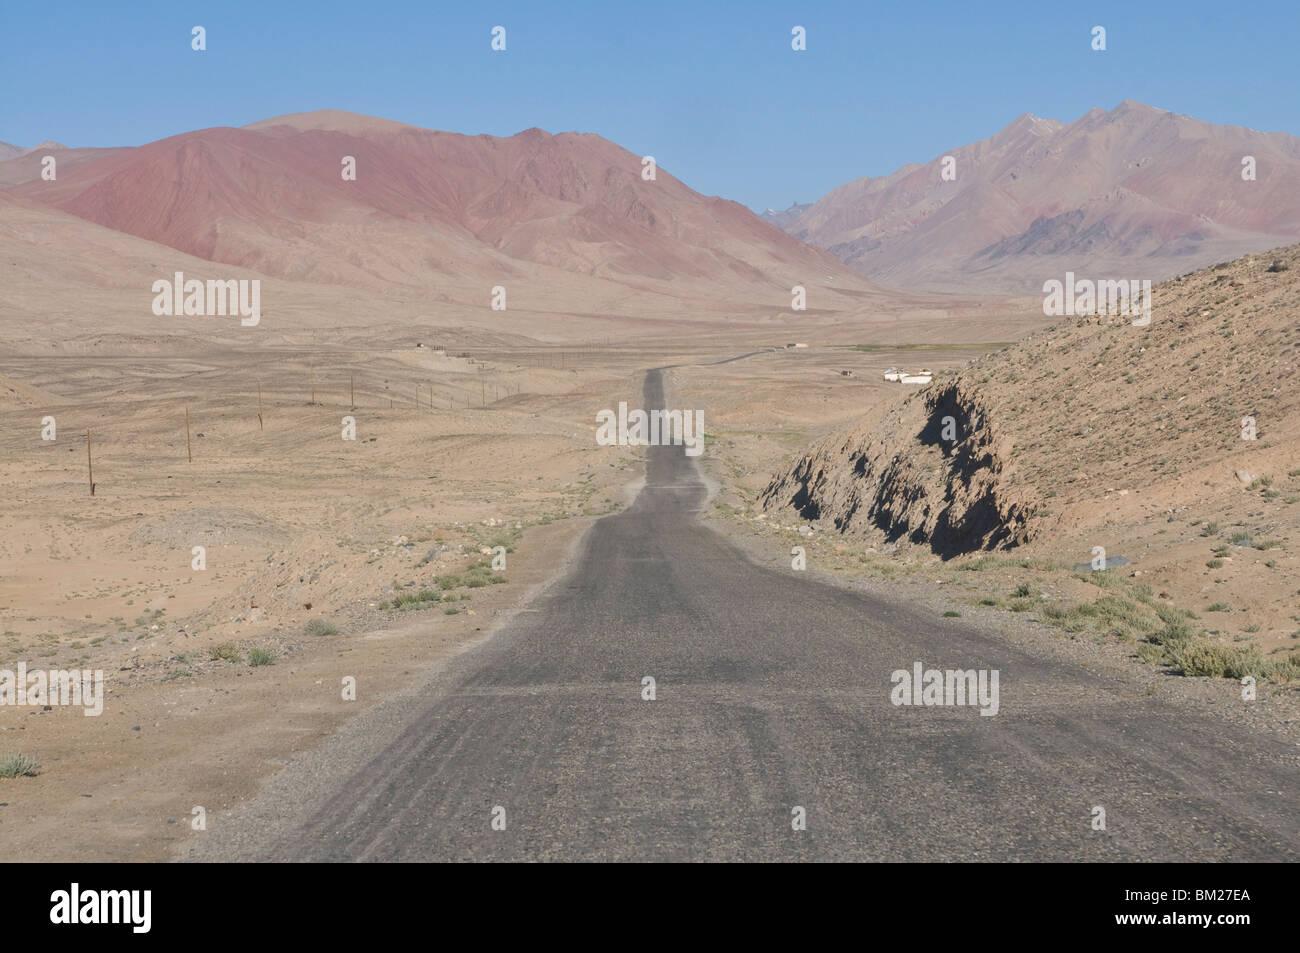 Pamir de la autopista que conduce al desierto, Tayikistán, en Asia Central Imagen De Stock